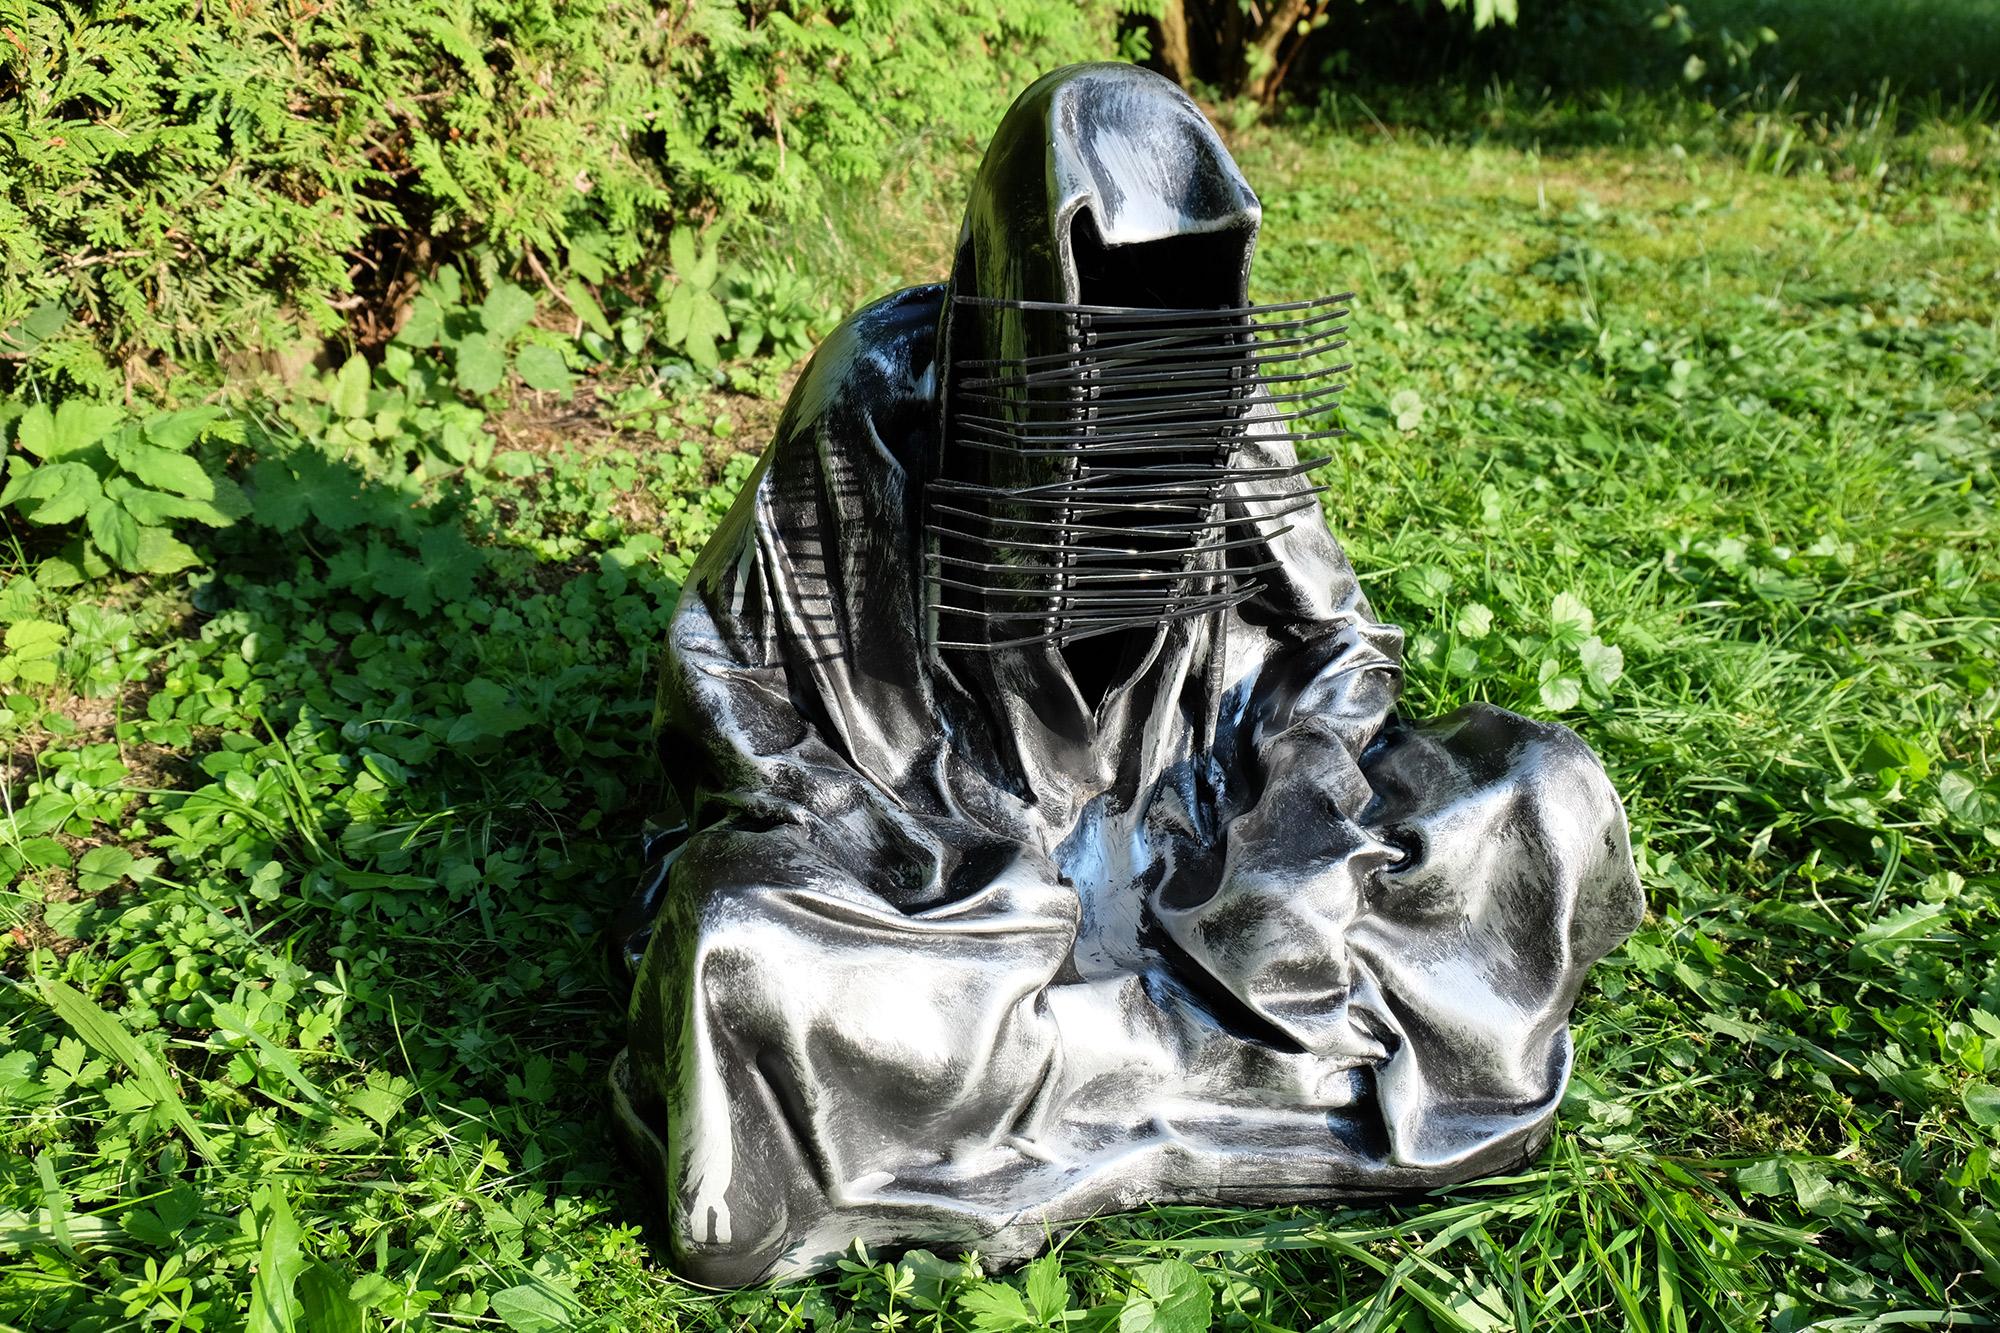 #guardiansoftime-#kielnhofer-#manfredkielnhofer-#Art-#arts-#arte-#Design-#sculpture-#statue-#cableties-#Artwork-#gallery-#antique-#mohawk-#Iroquois-#moslem-#islam-#religion-4284